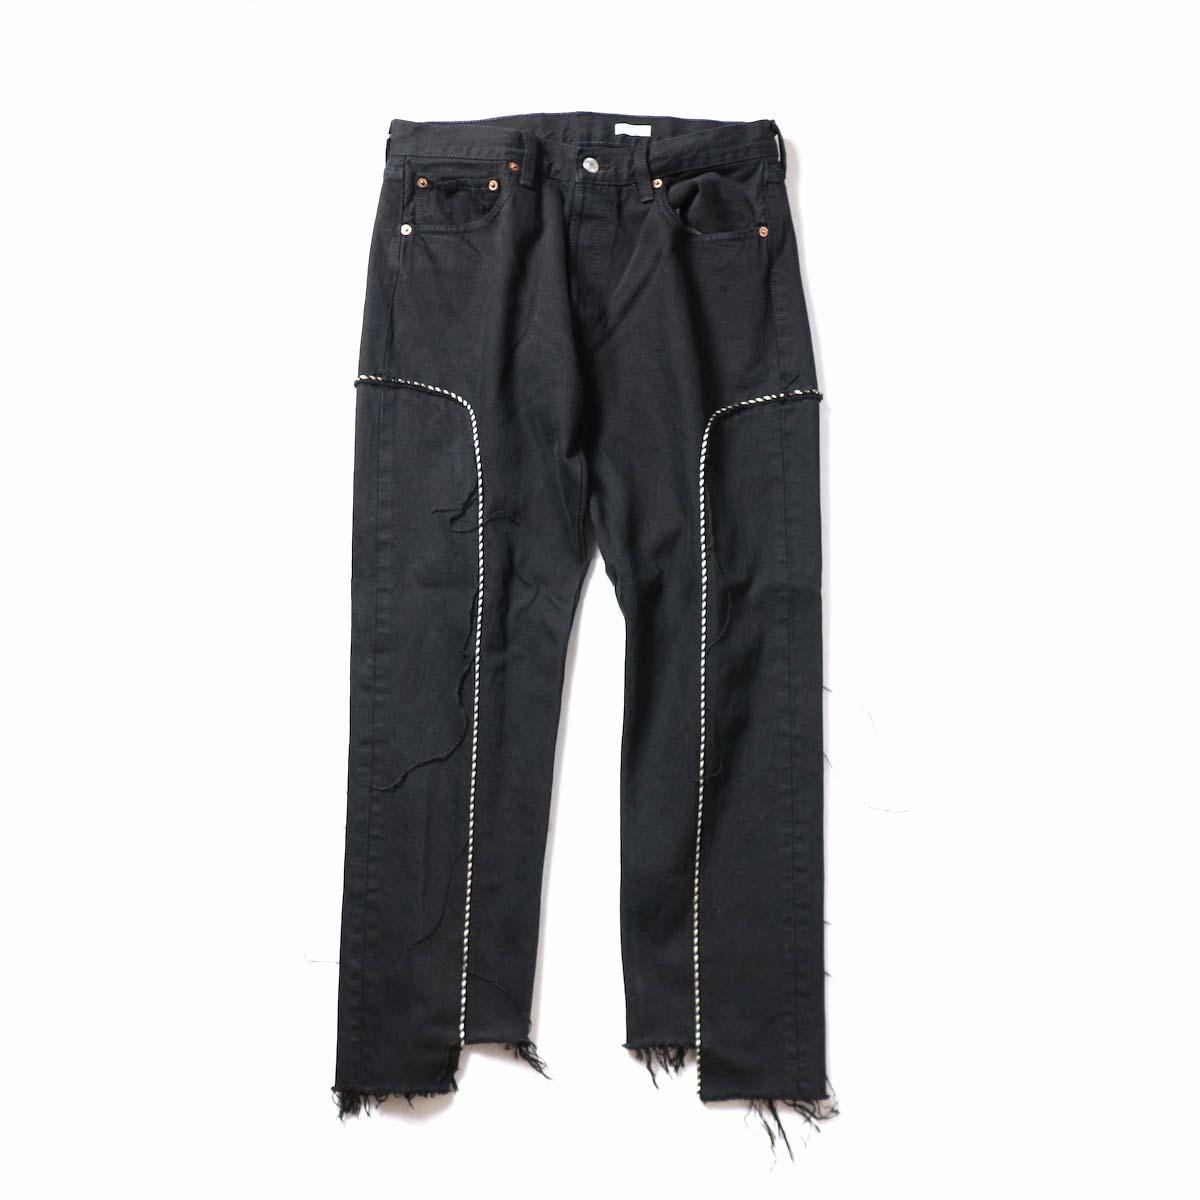 OLD PARK / Western Jeans Black (Msize-E)